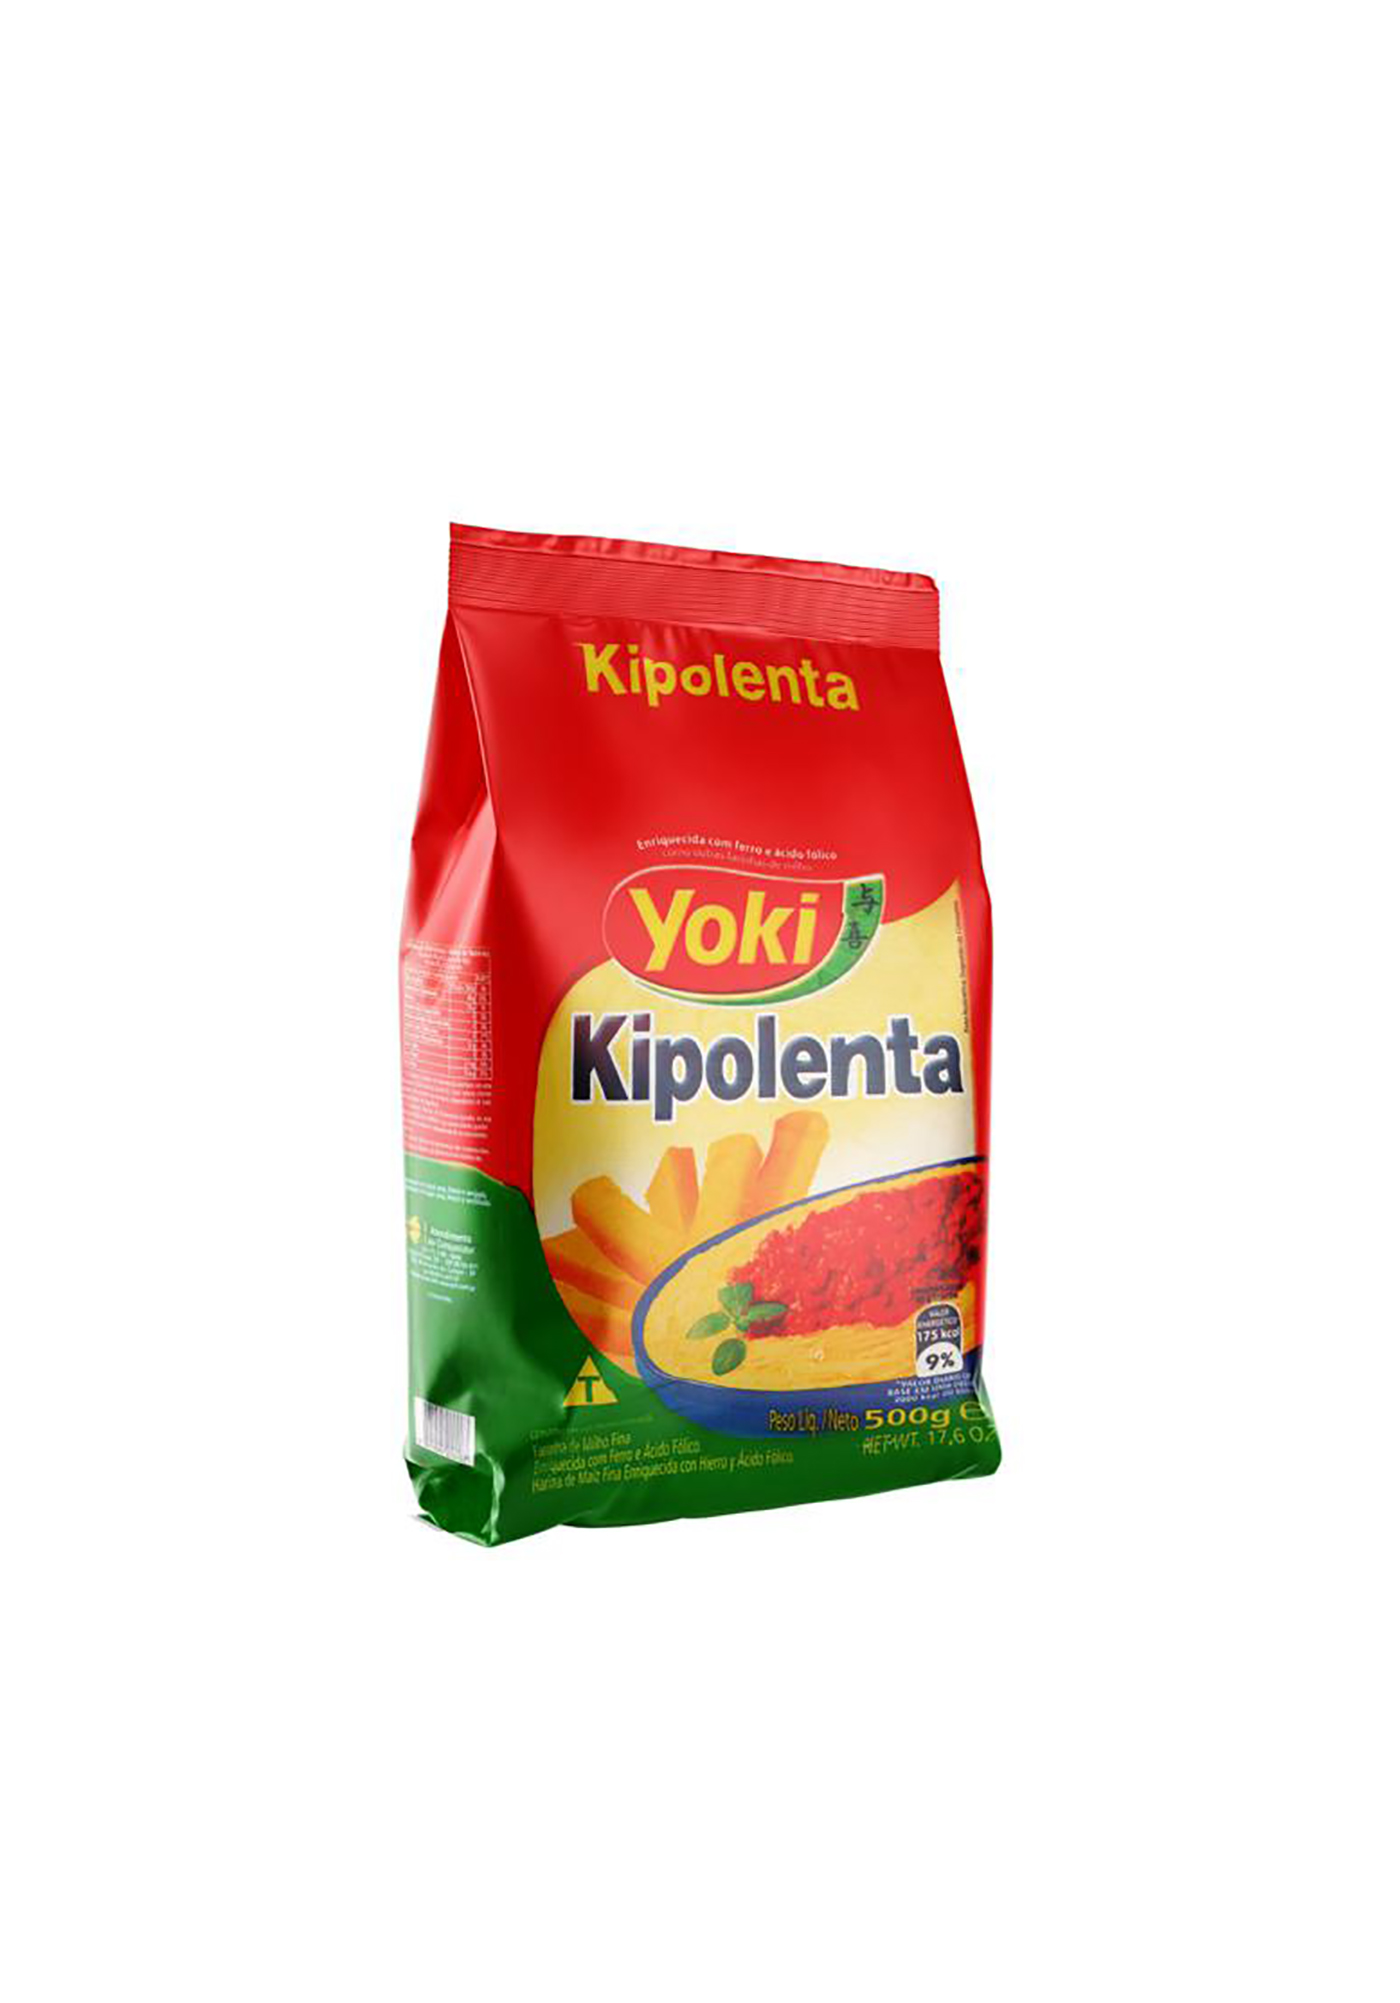 Yoki KIpolenta 500g